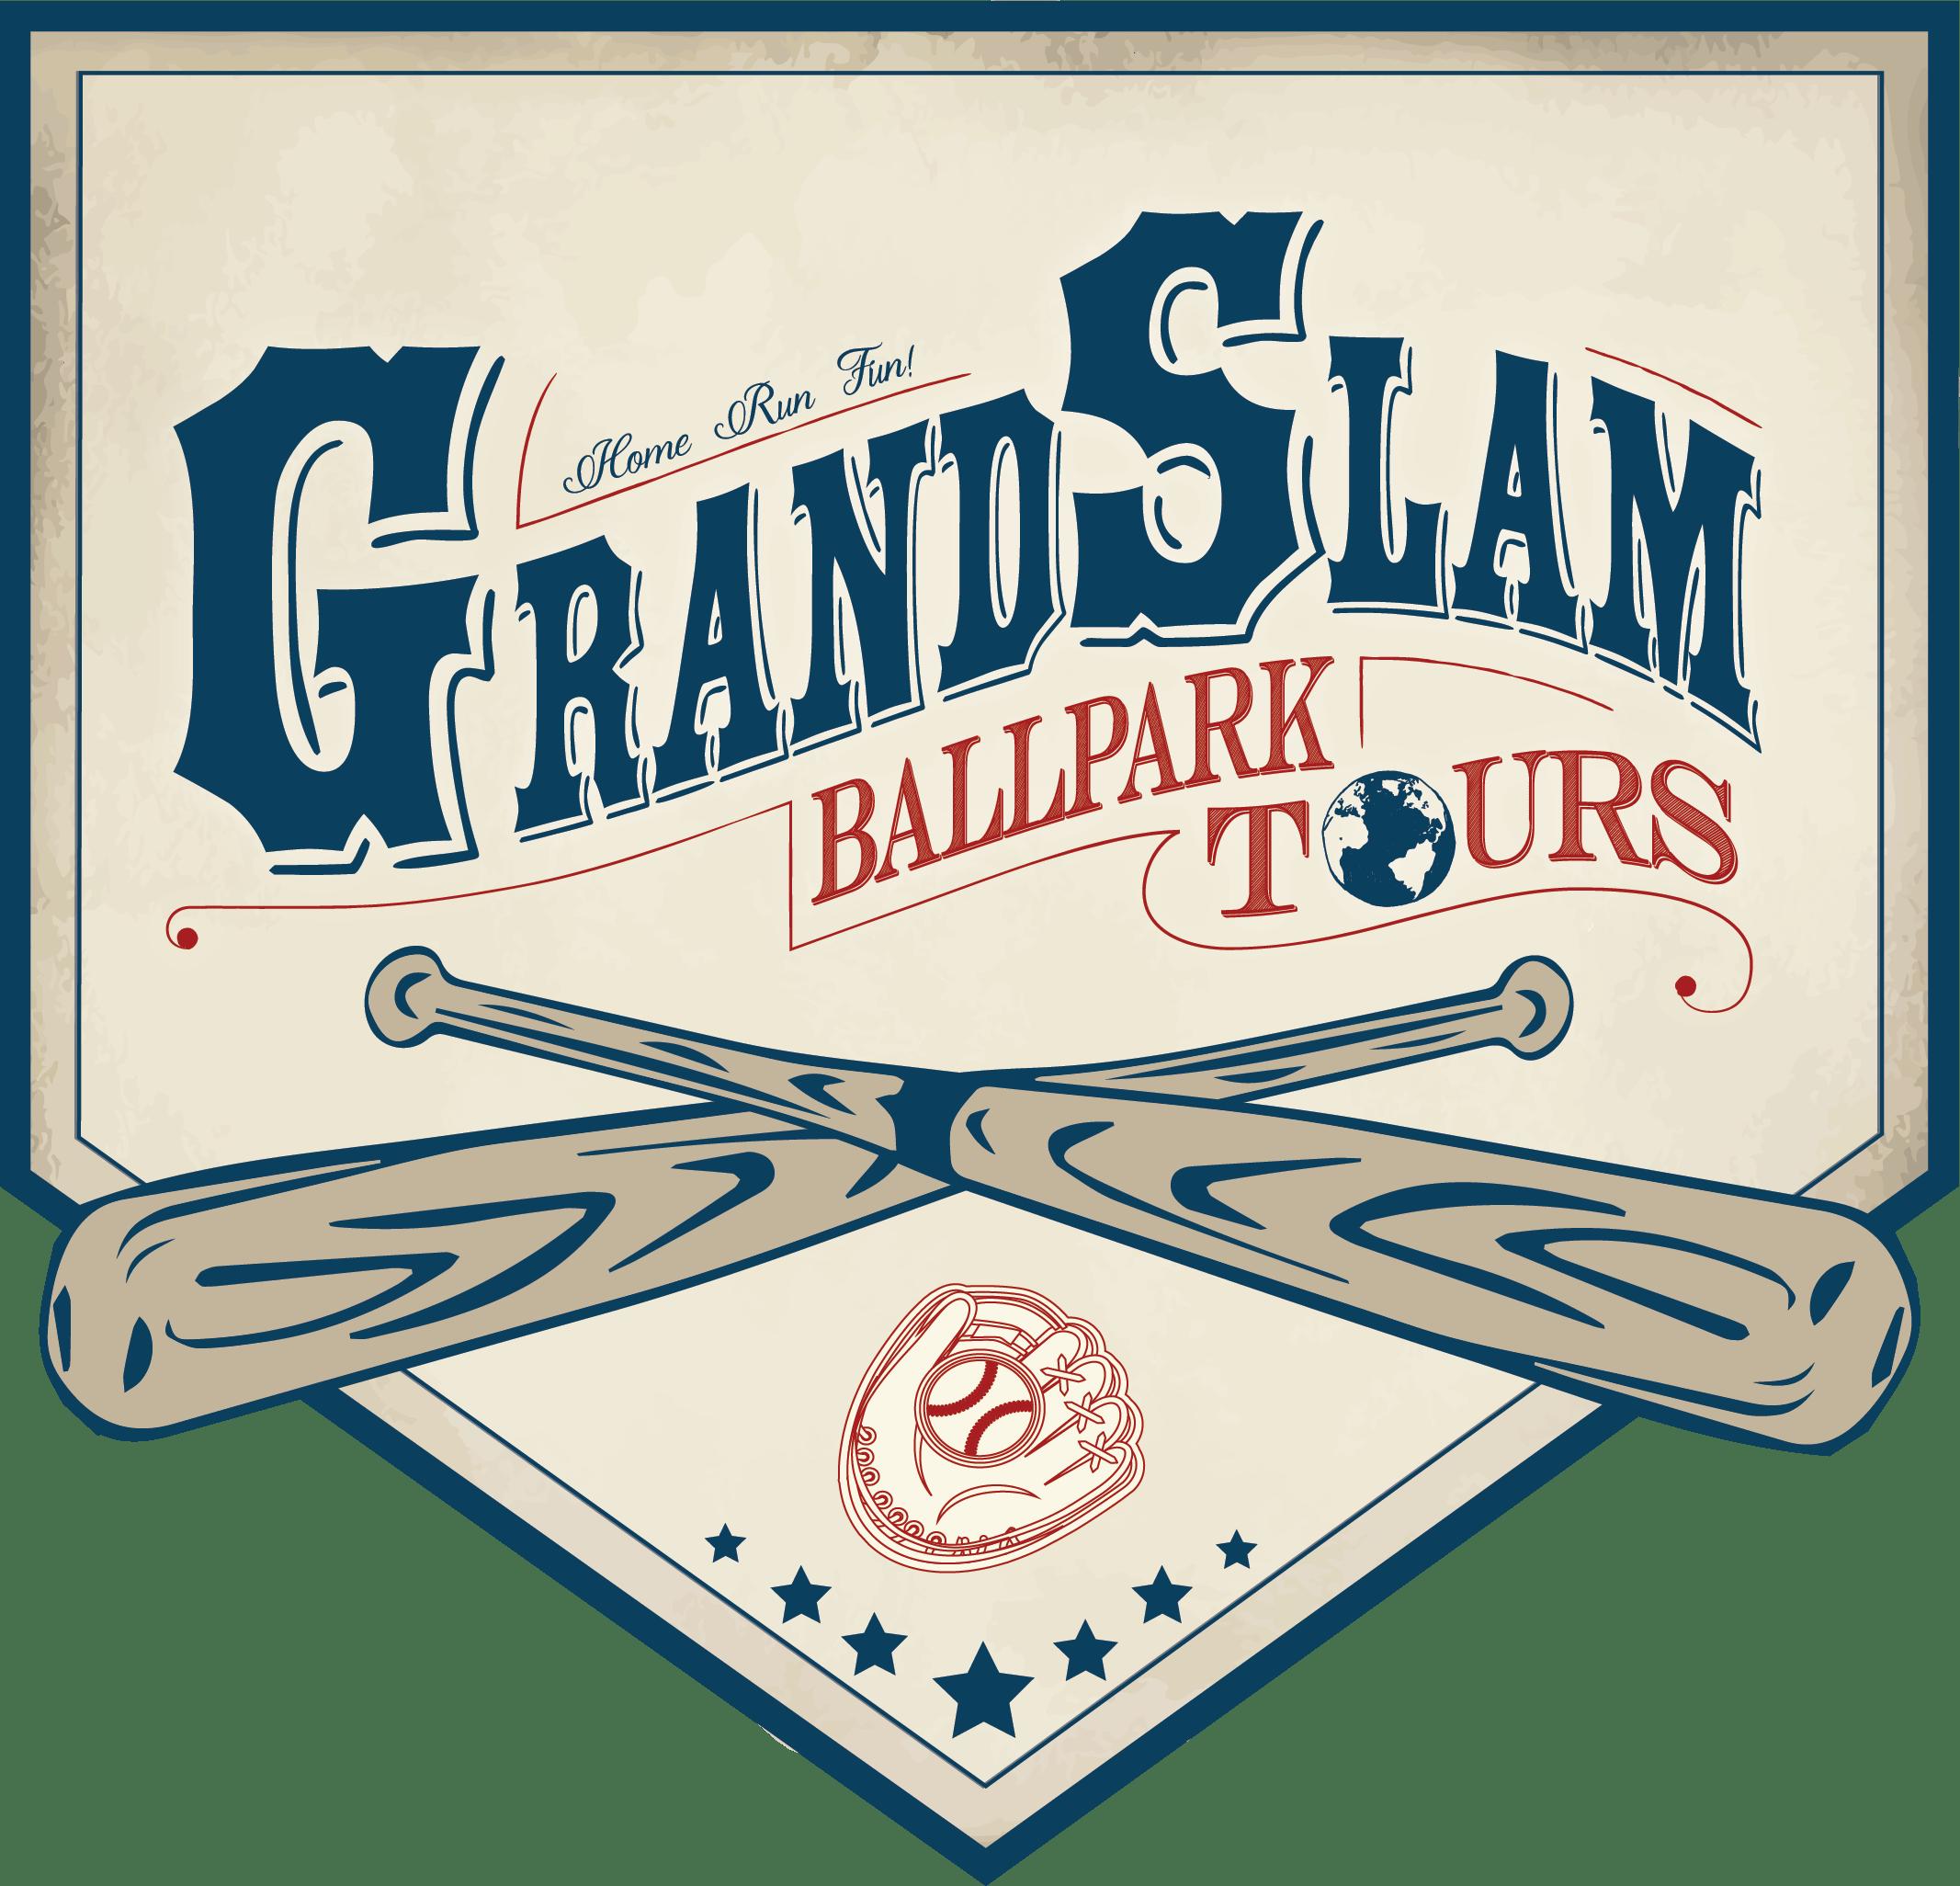 Grand slam baseball wording clipart picture library Grand Slam Ballpark Tours – ChemistCreative picture library